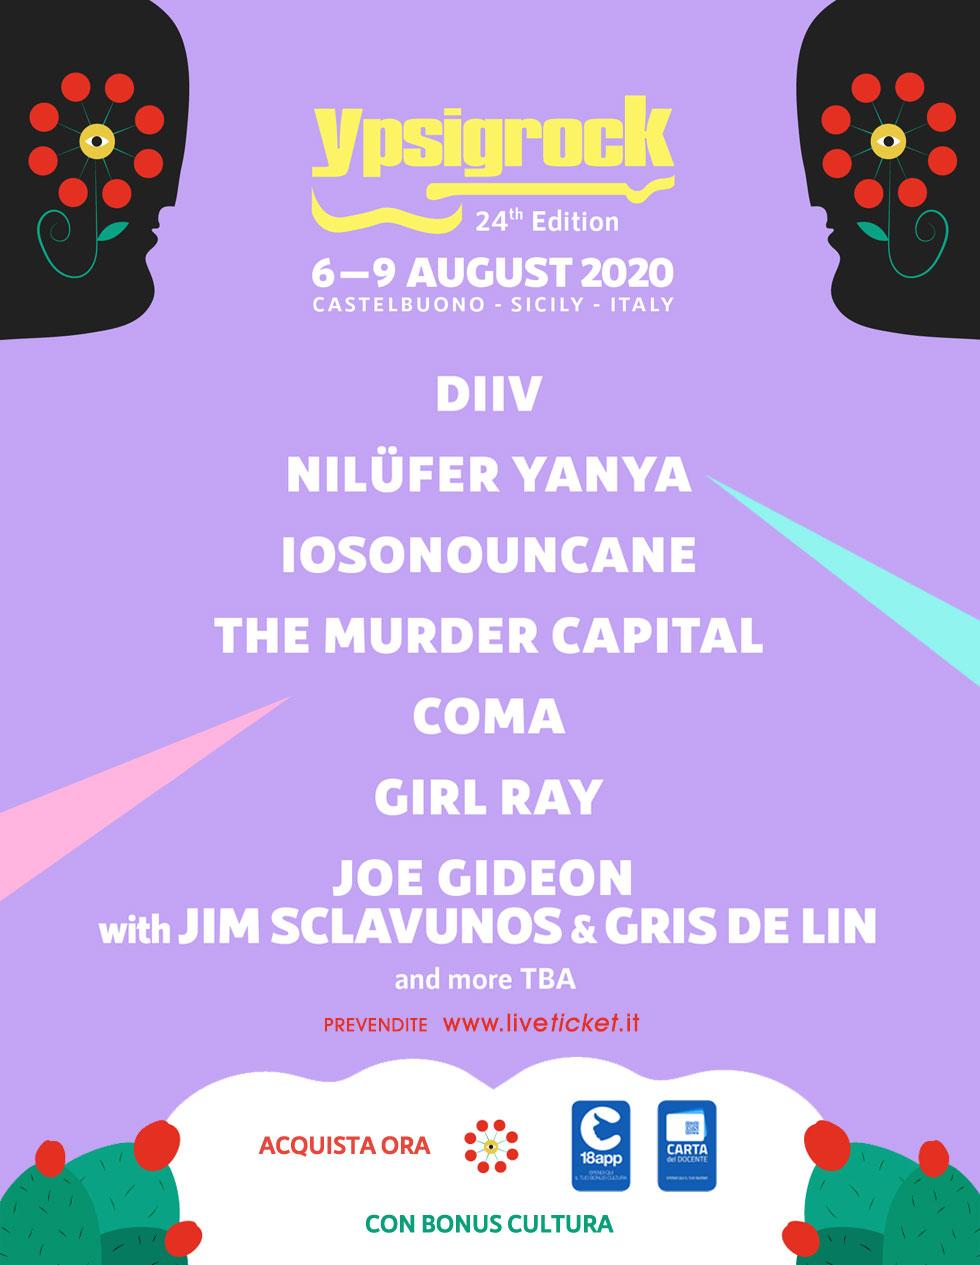 Ypsigrock Festival 2020